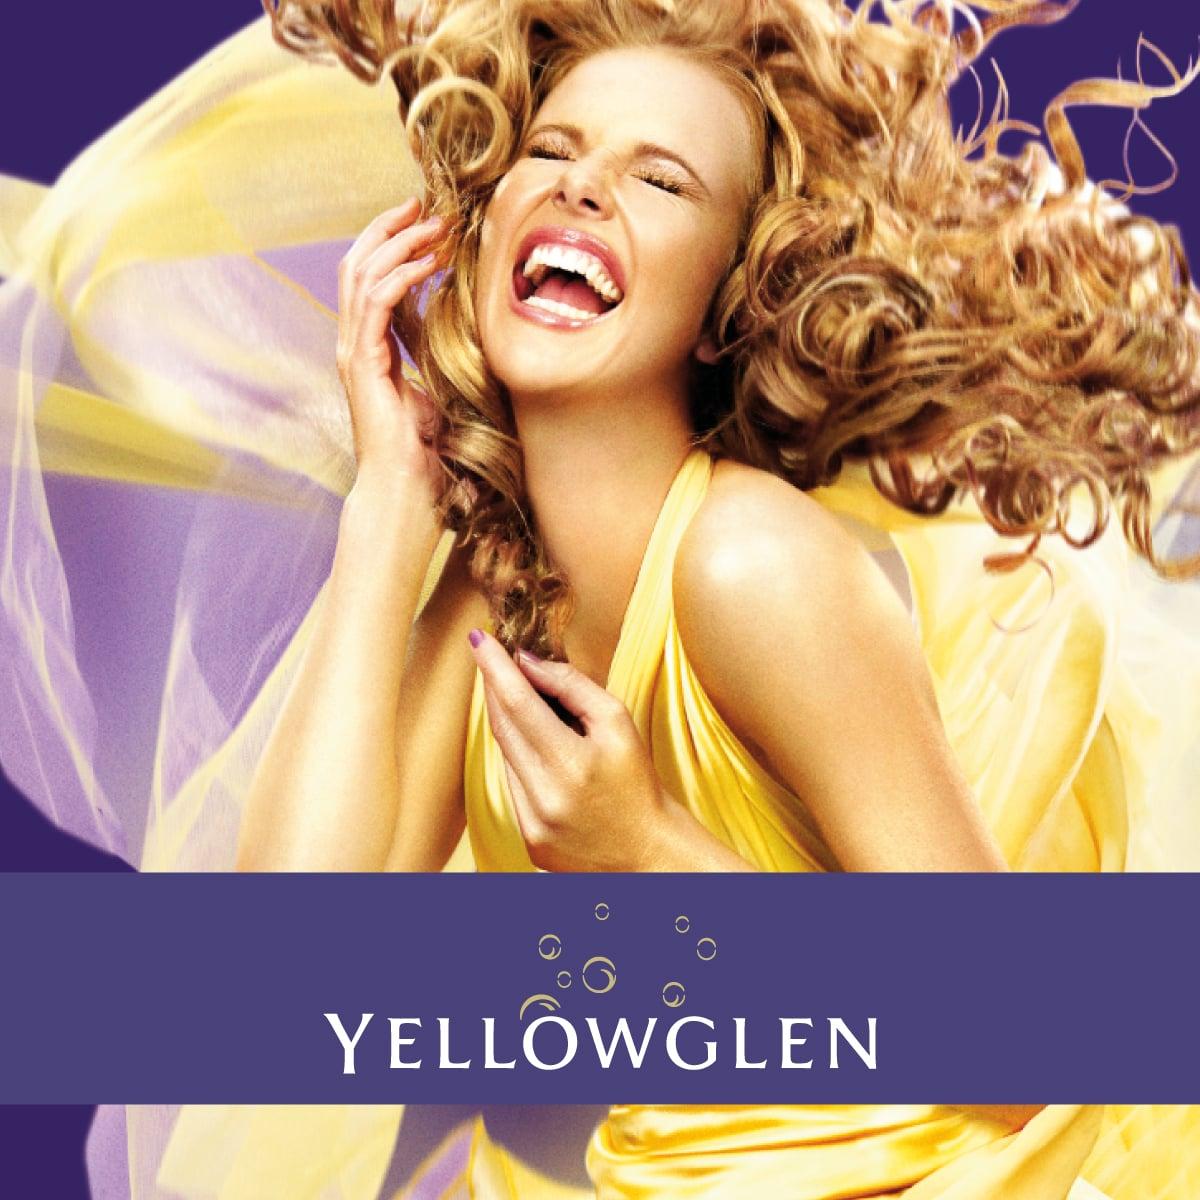 Davidson Branding FMCG Yellowglen